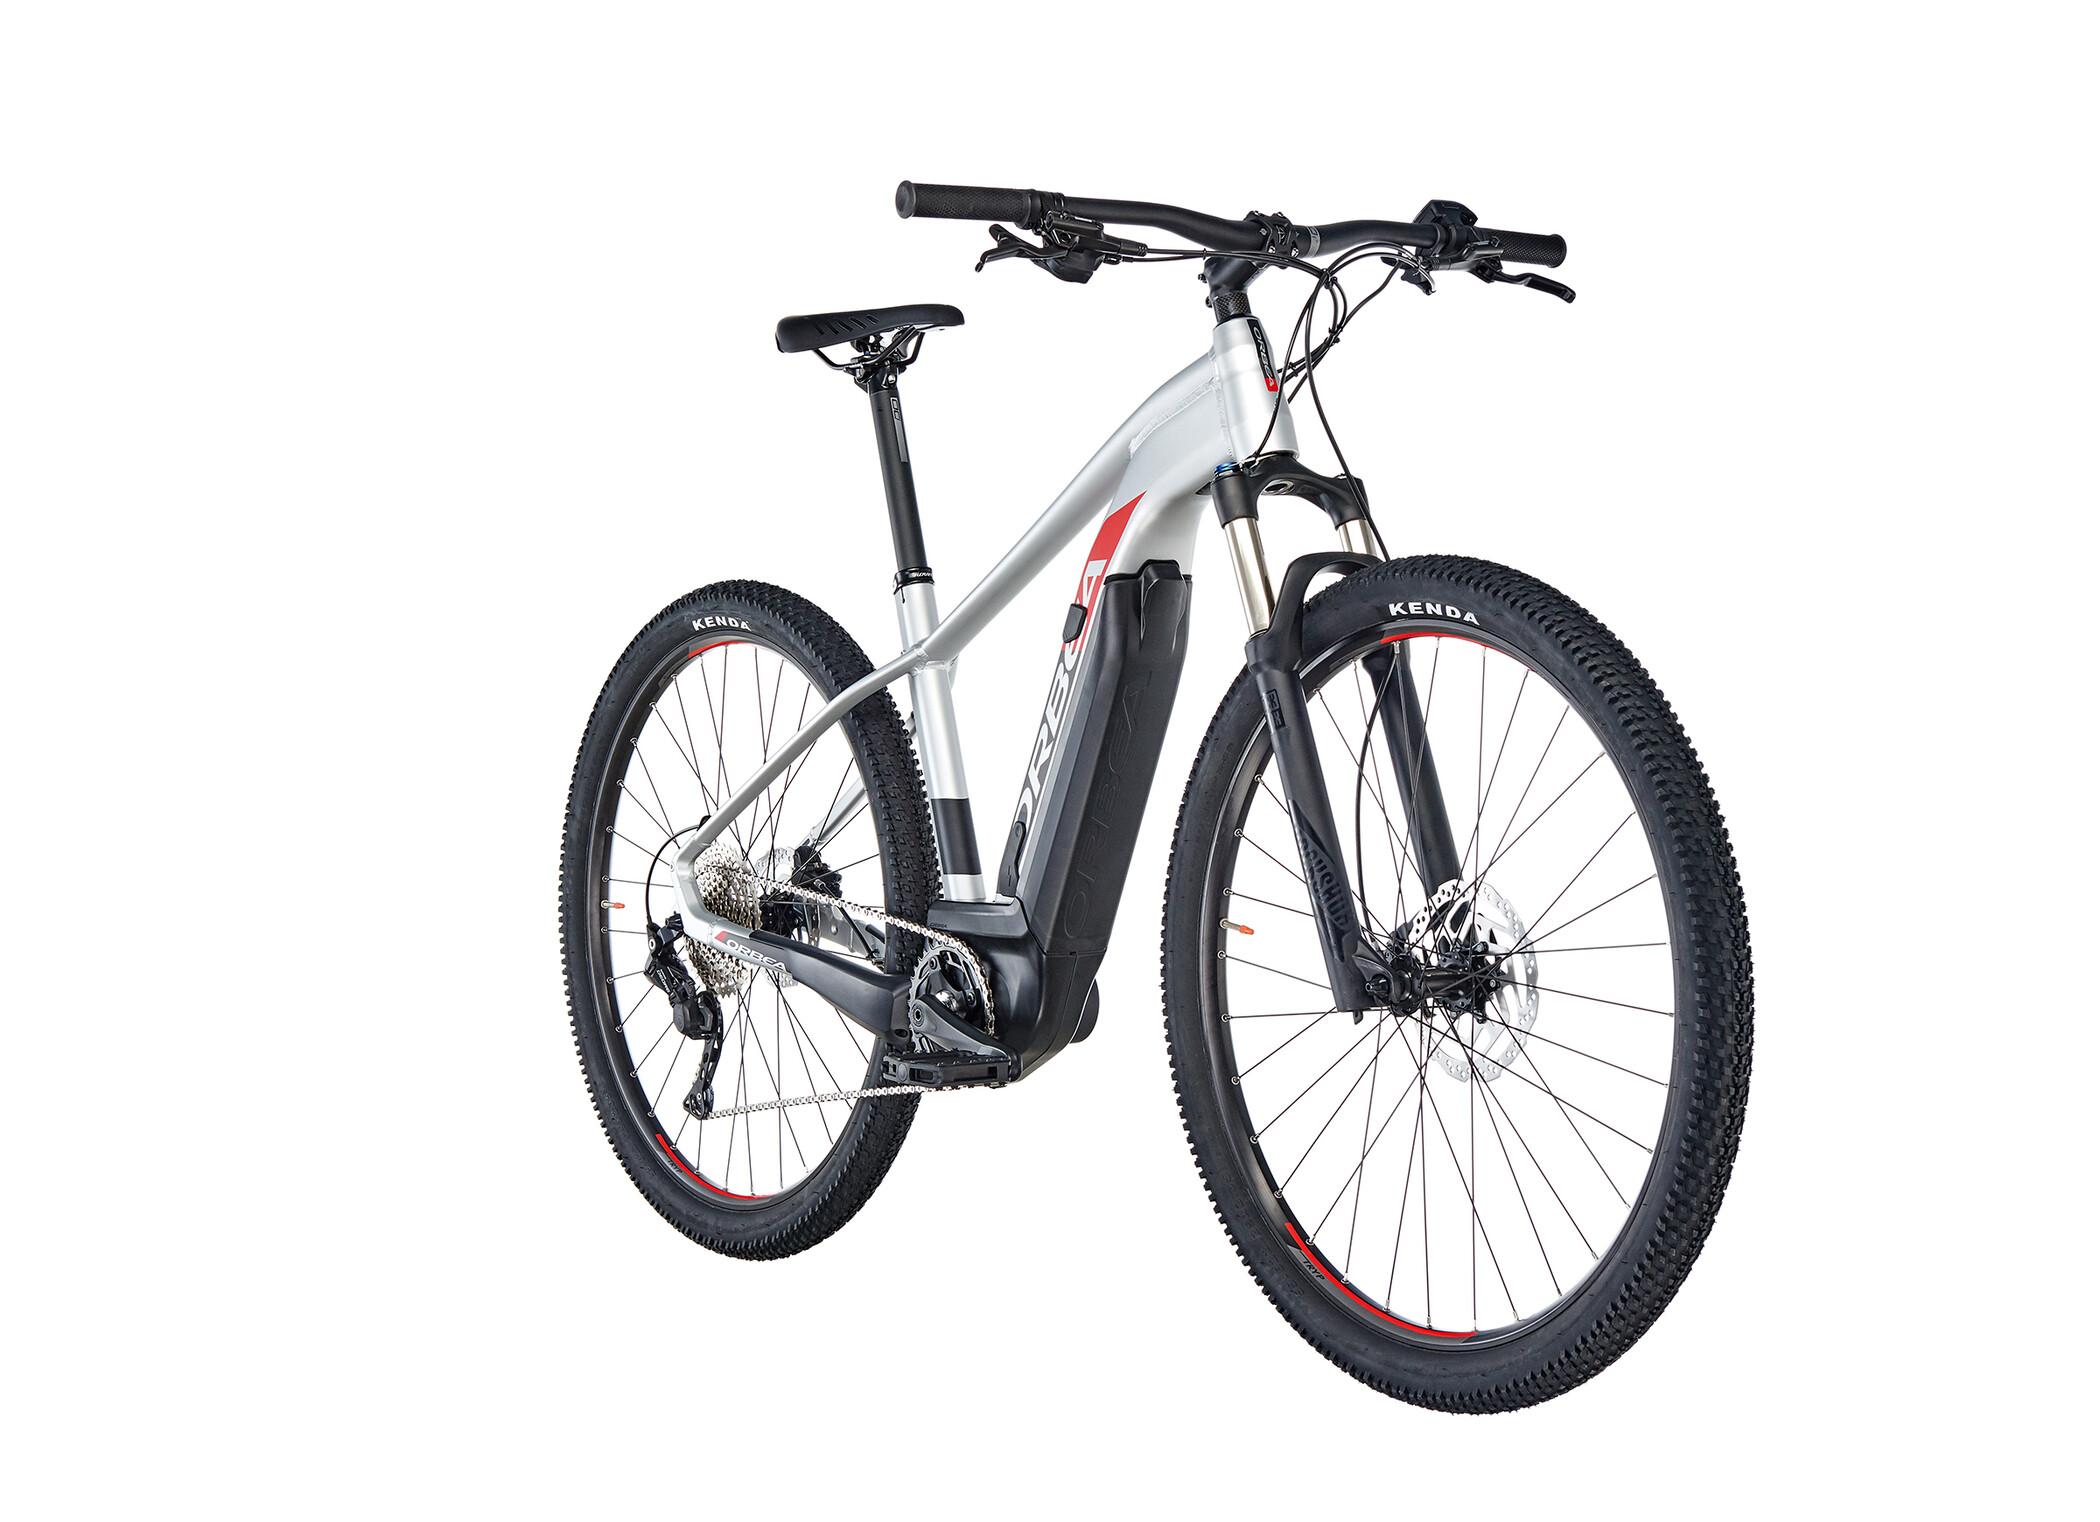 ORBEA Keram 15 29 inches, platinum/red (2019) | Mountainbikes